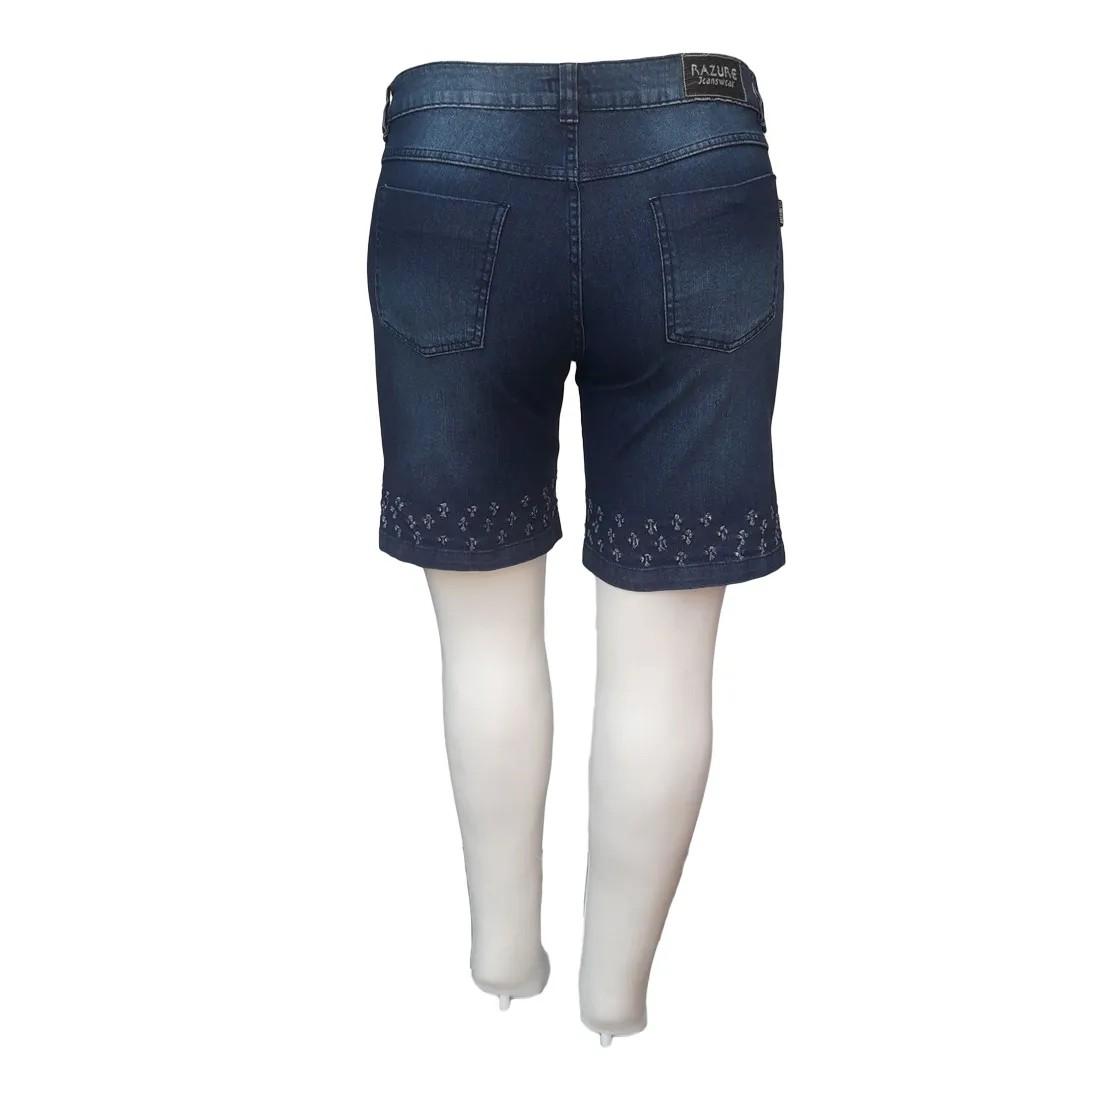 Bermuda Jeans Feminina Plus Size c/ Detalhes Vazados Barra